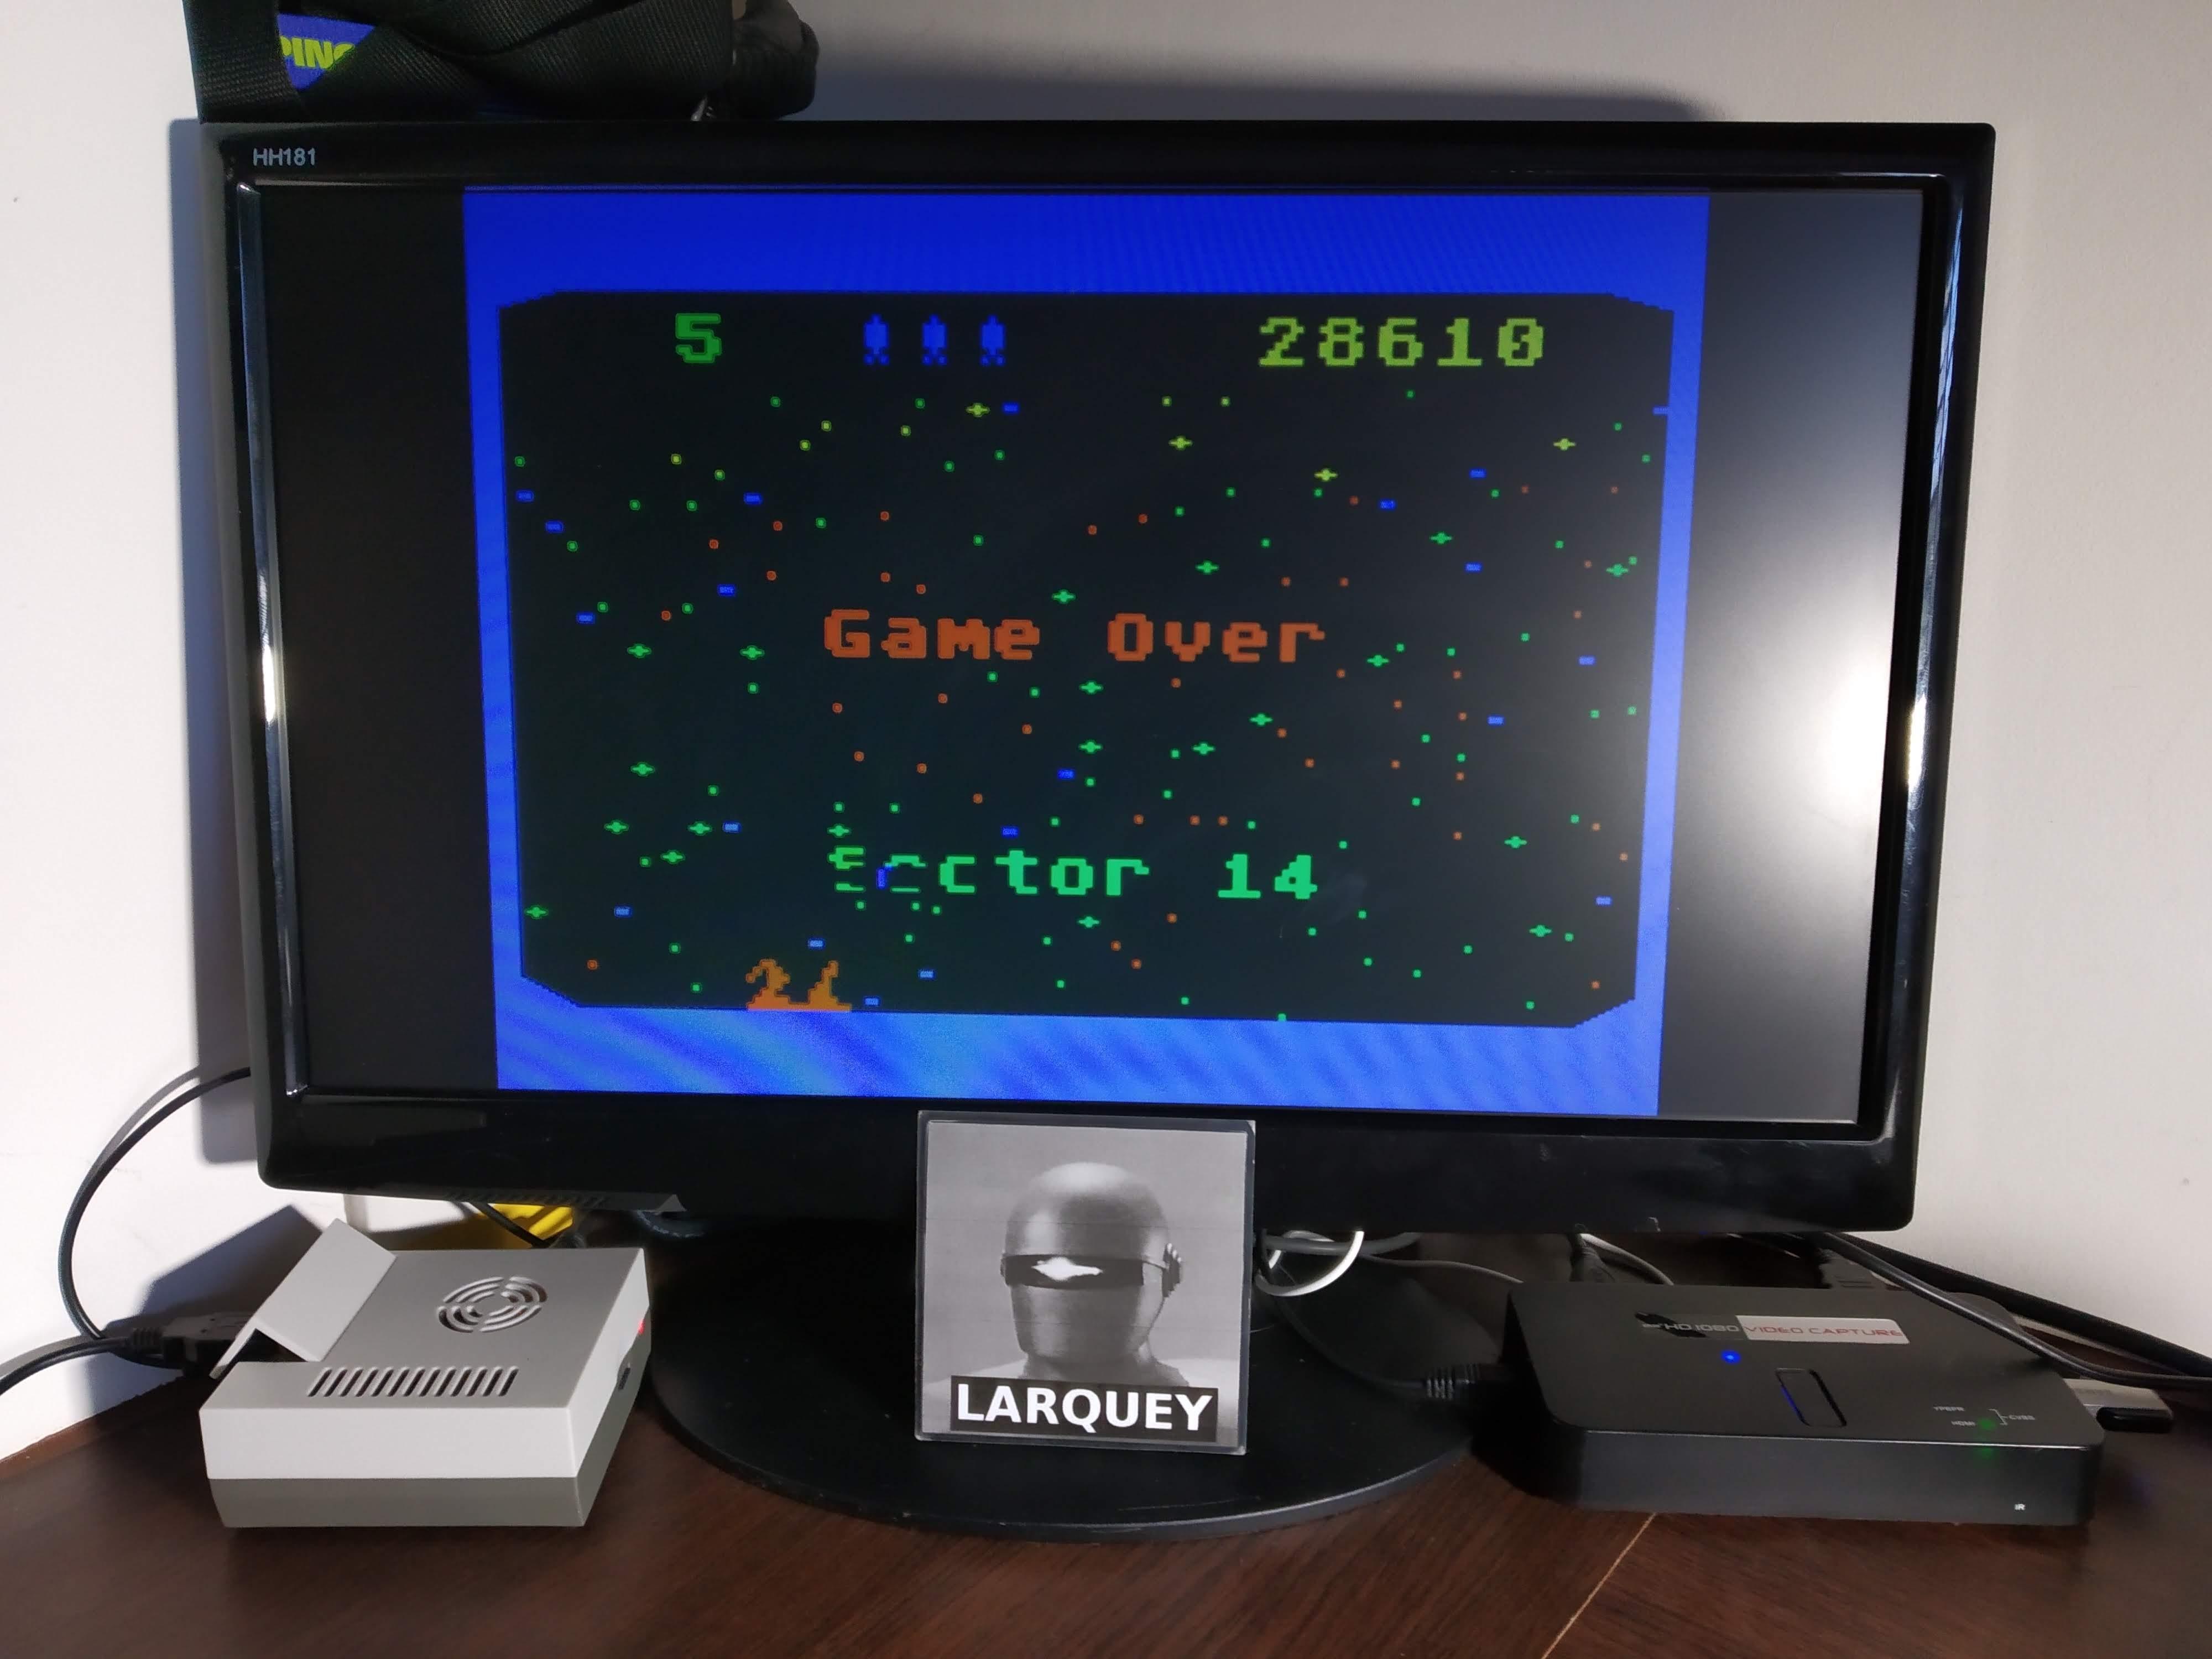 Larquey: Beamrider (Atari 5200 Emulated) 28,610 points on 2019-11-09 12:55:20